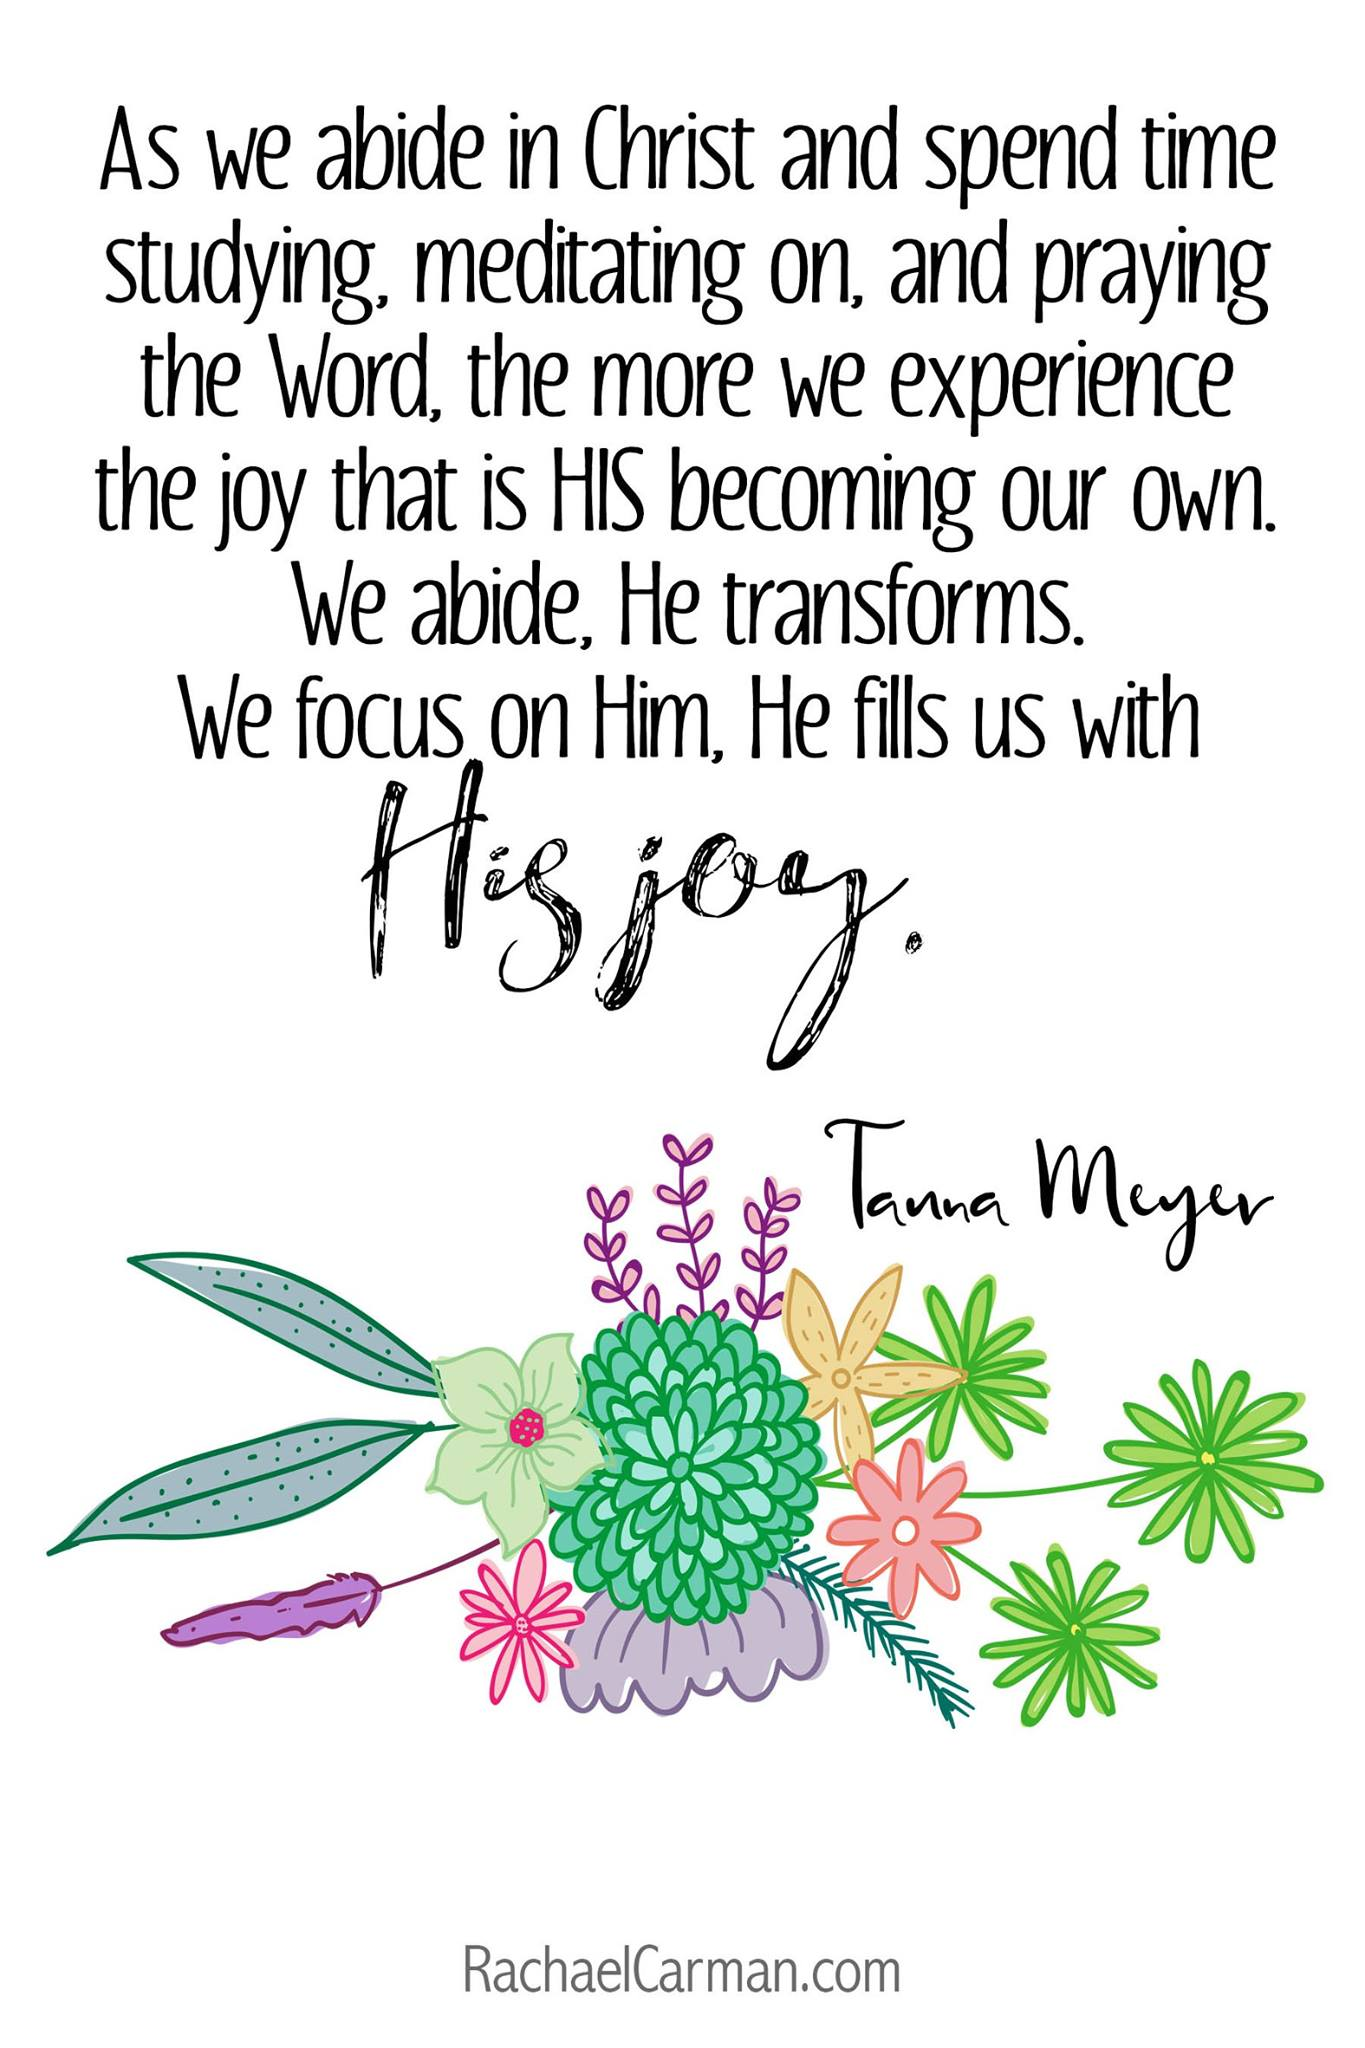 Our theme for April is Faith